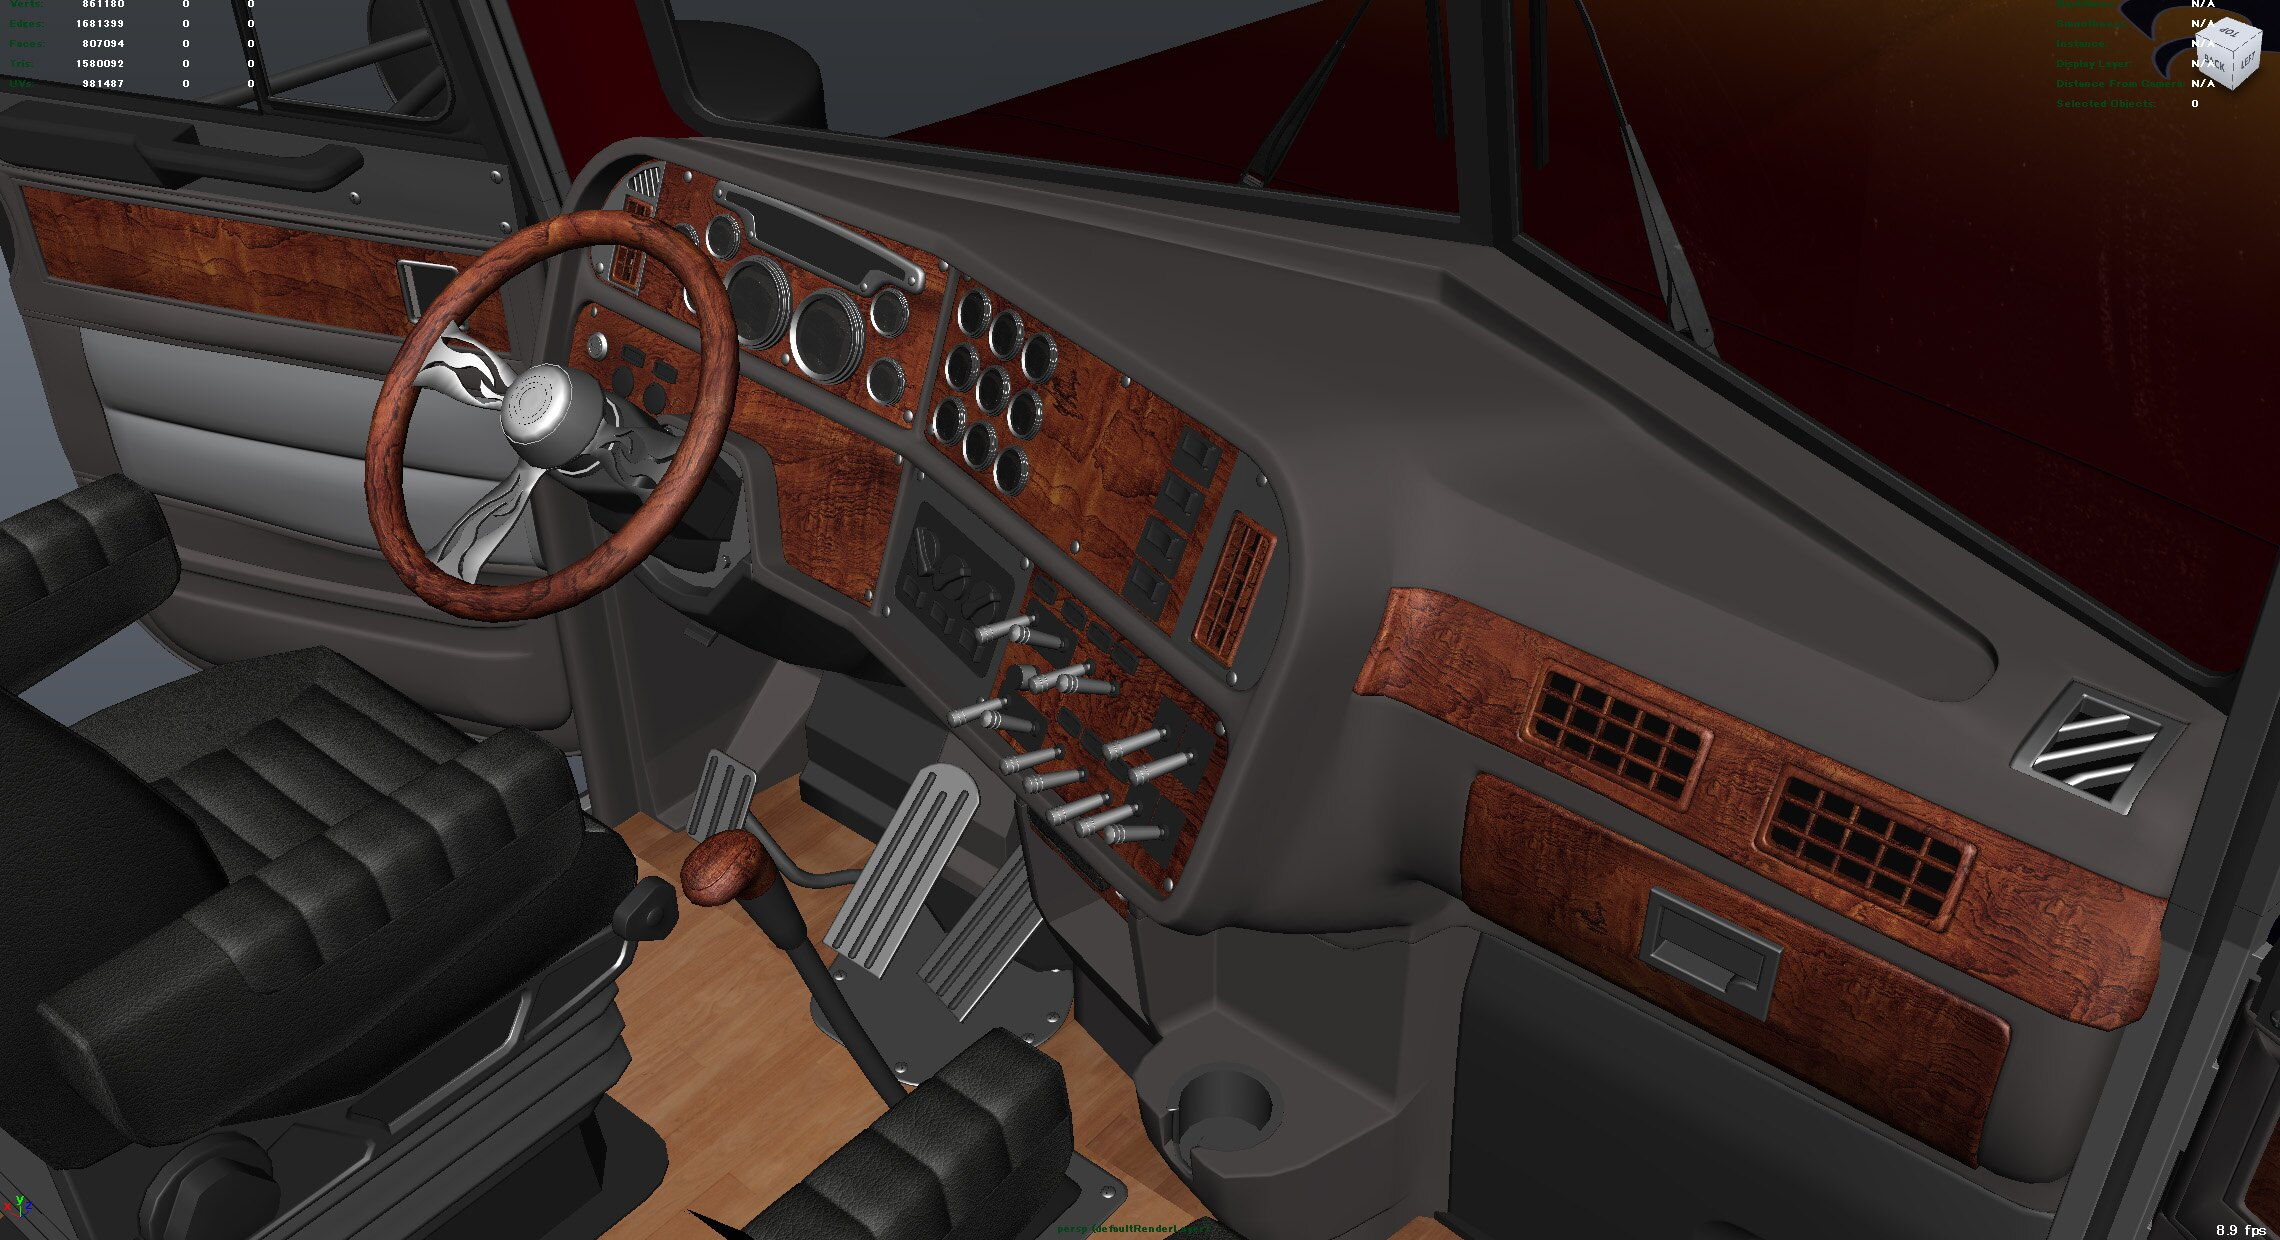 peterbilt_interior001.jpg